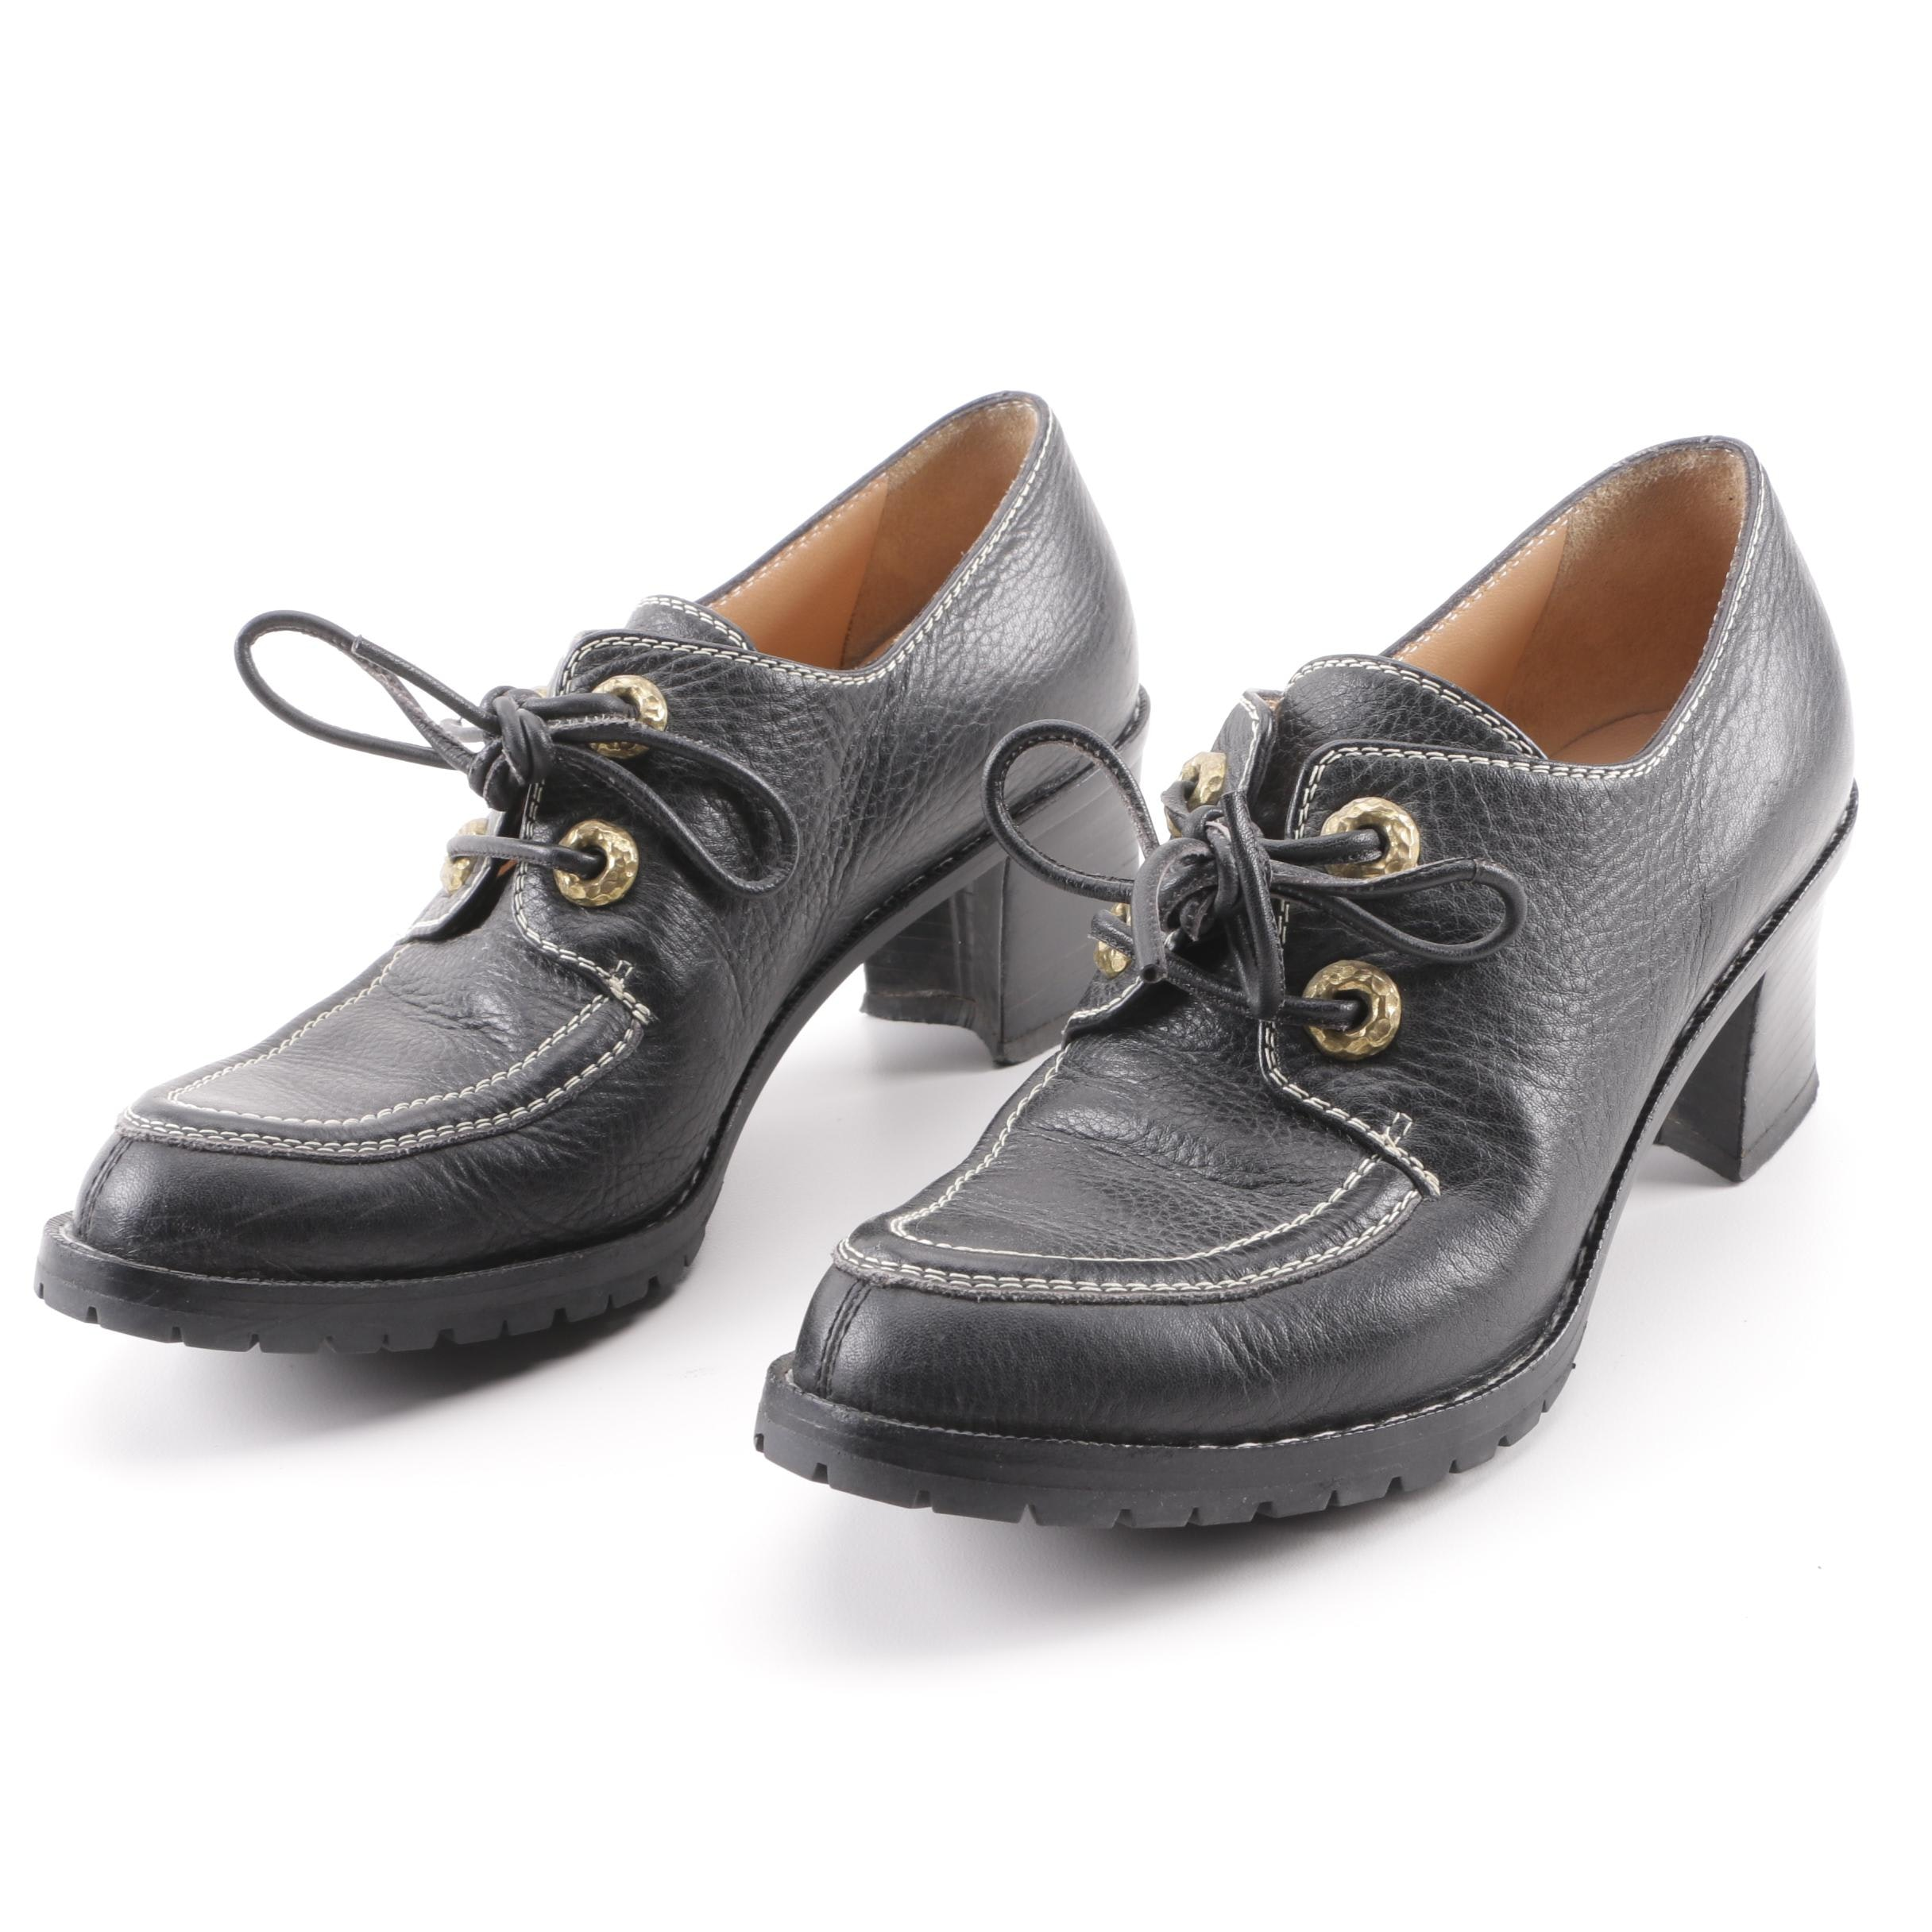 Women's Ombeline Paris Black Leather Heeled Oxfords